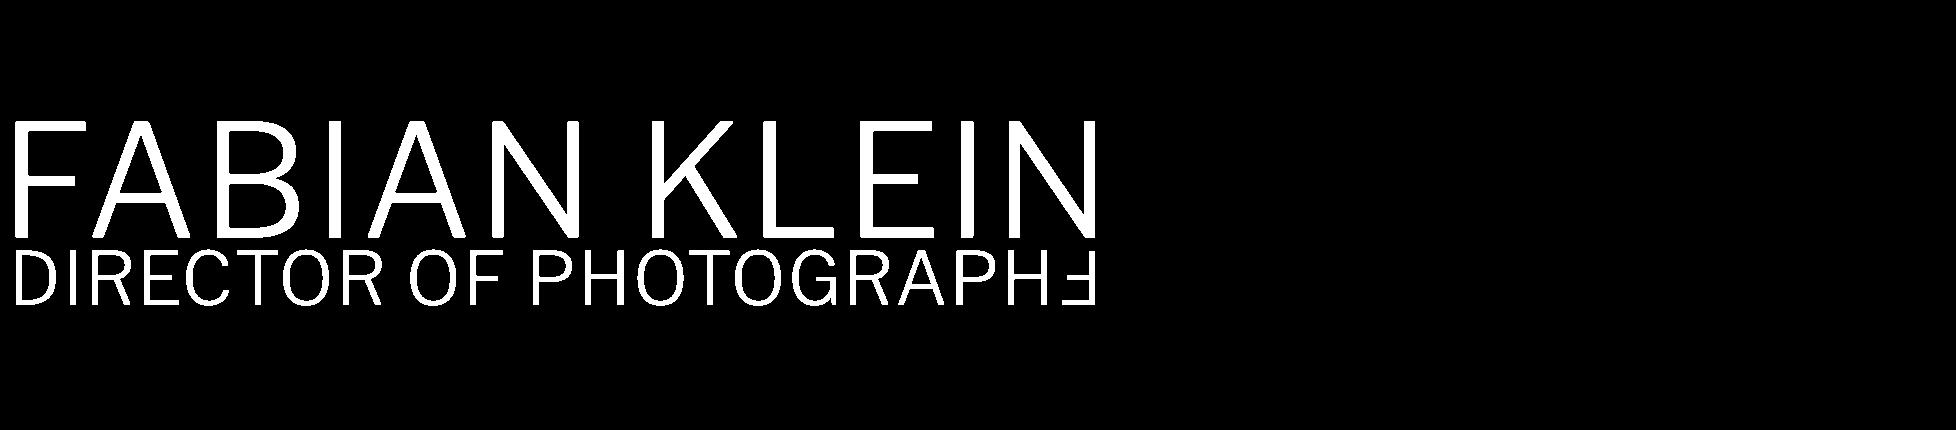 Fabian Klein DOP